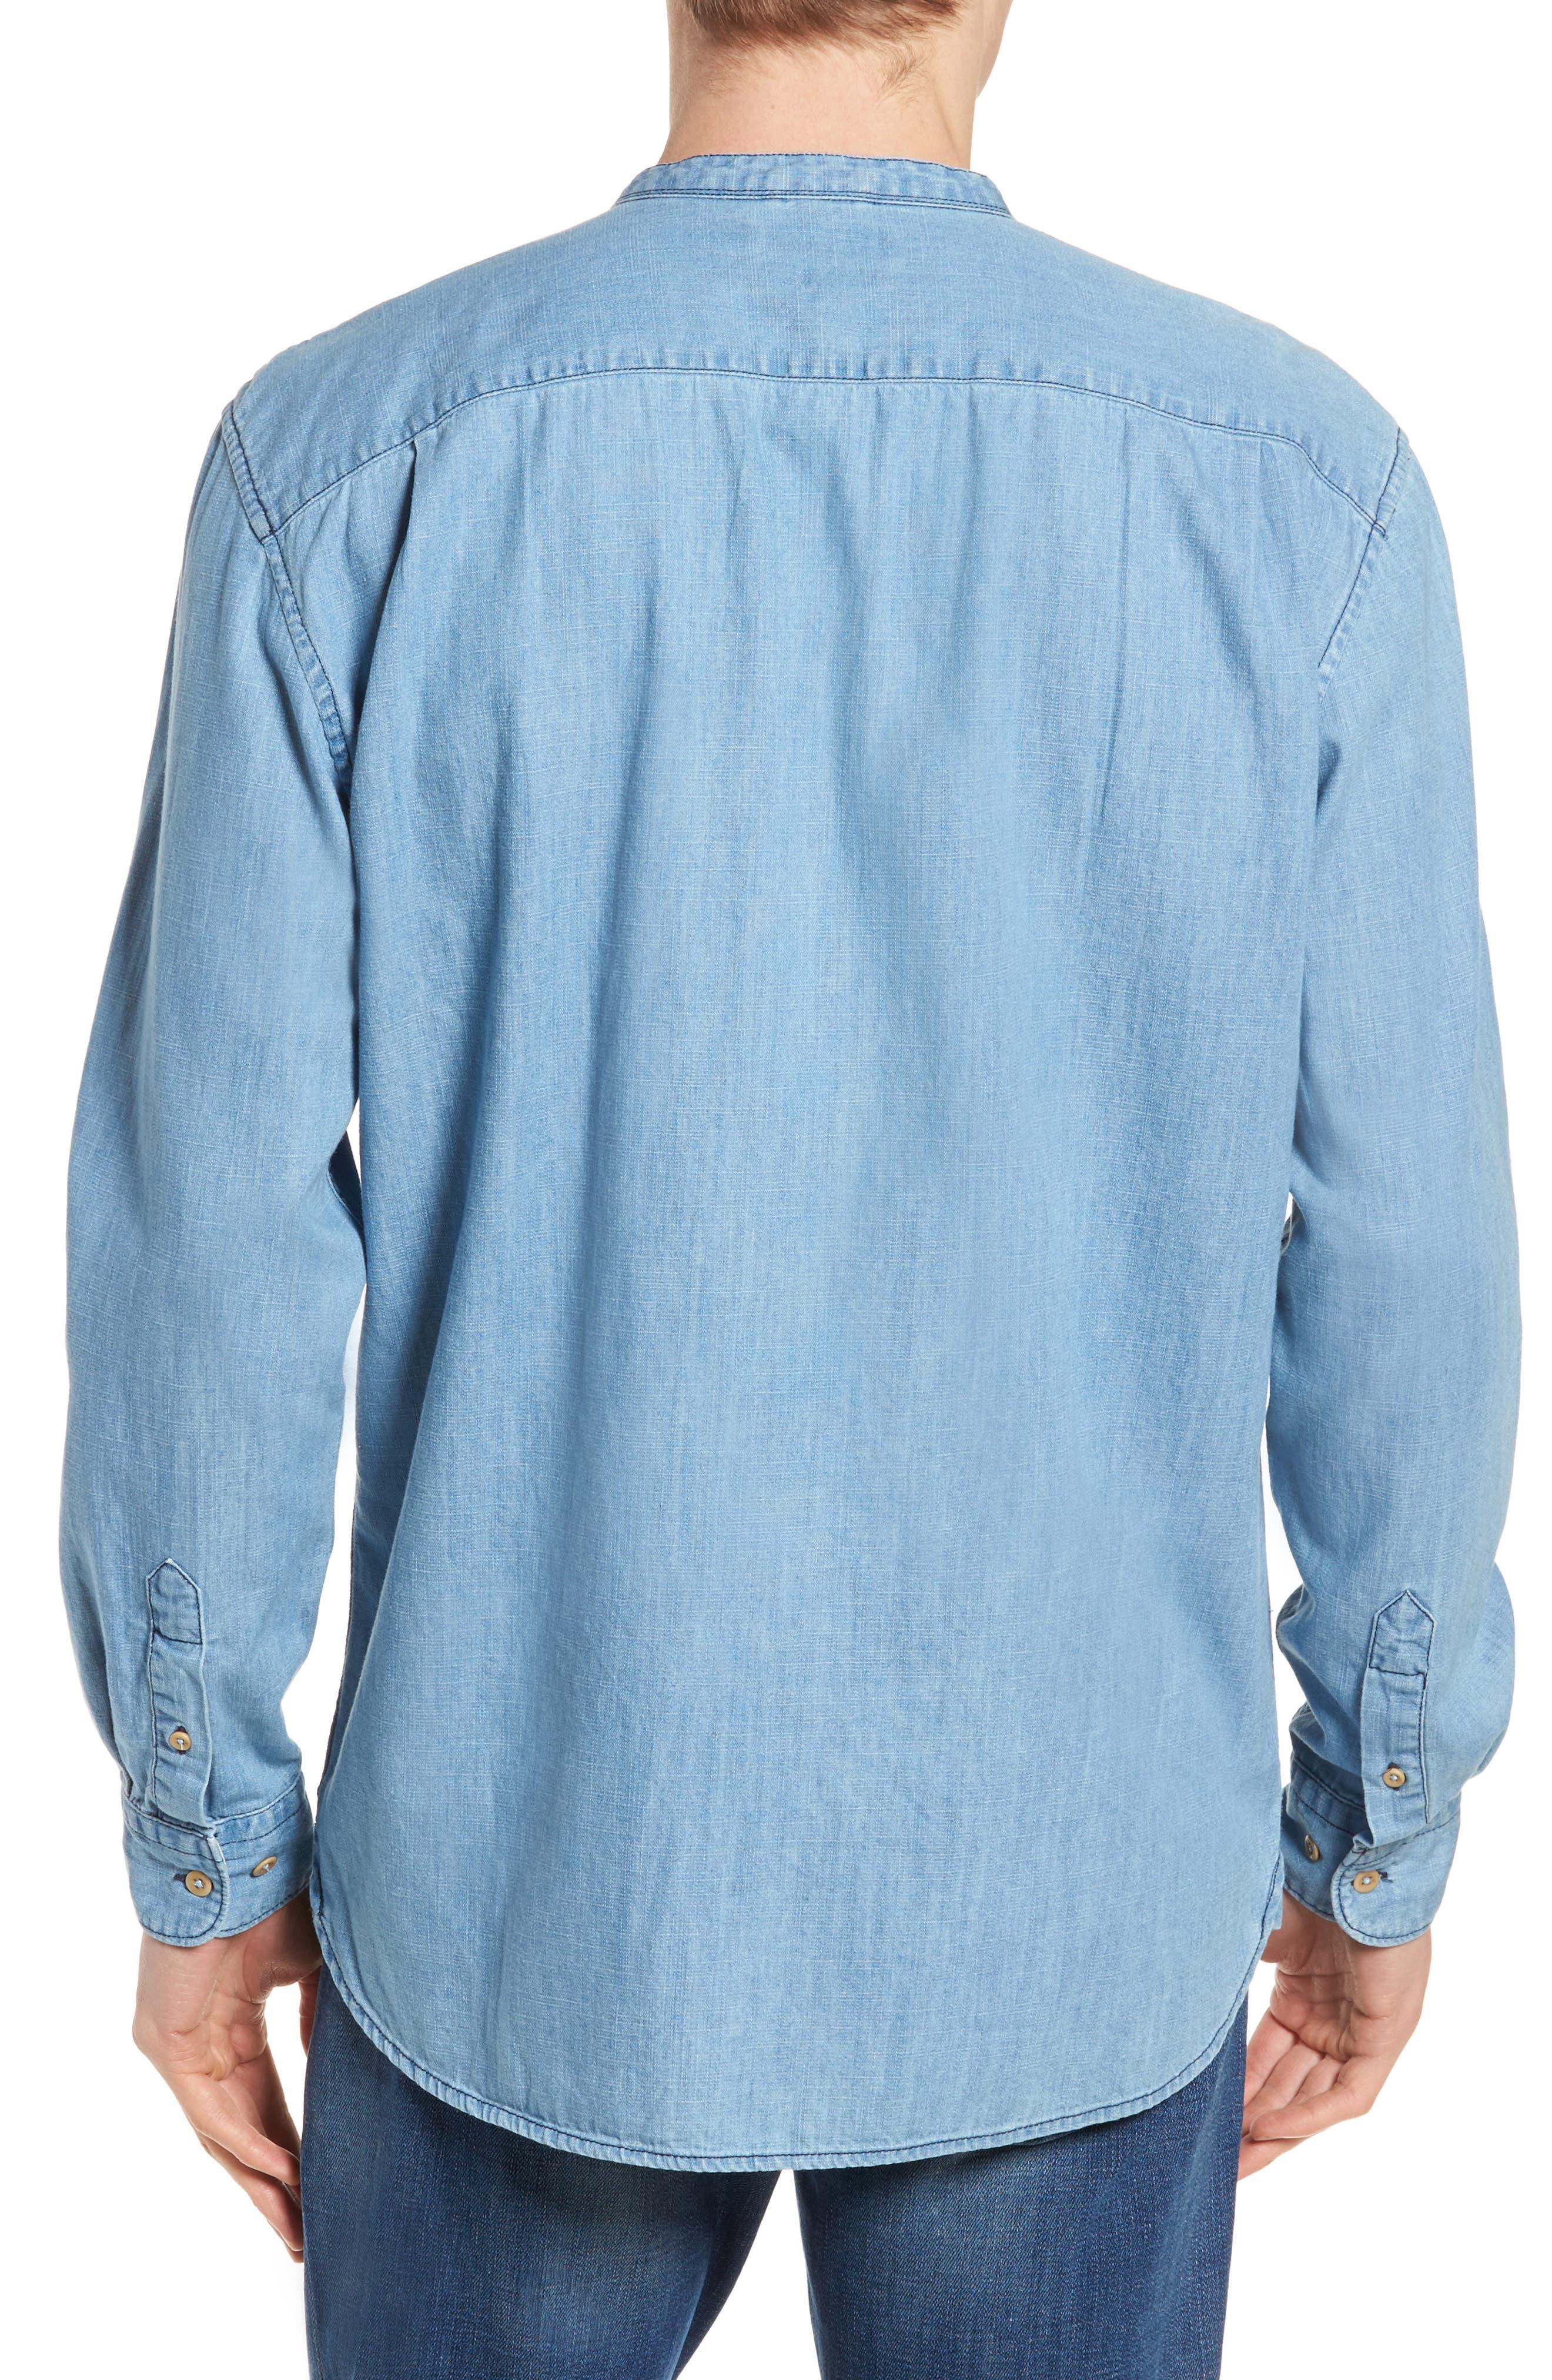 Core Denim Regular Fit Sport Shirt,                             Alternate thumbnail 2, color,                             Bleach